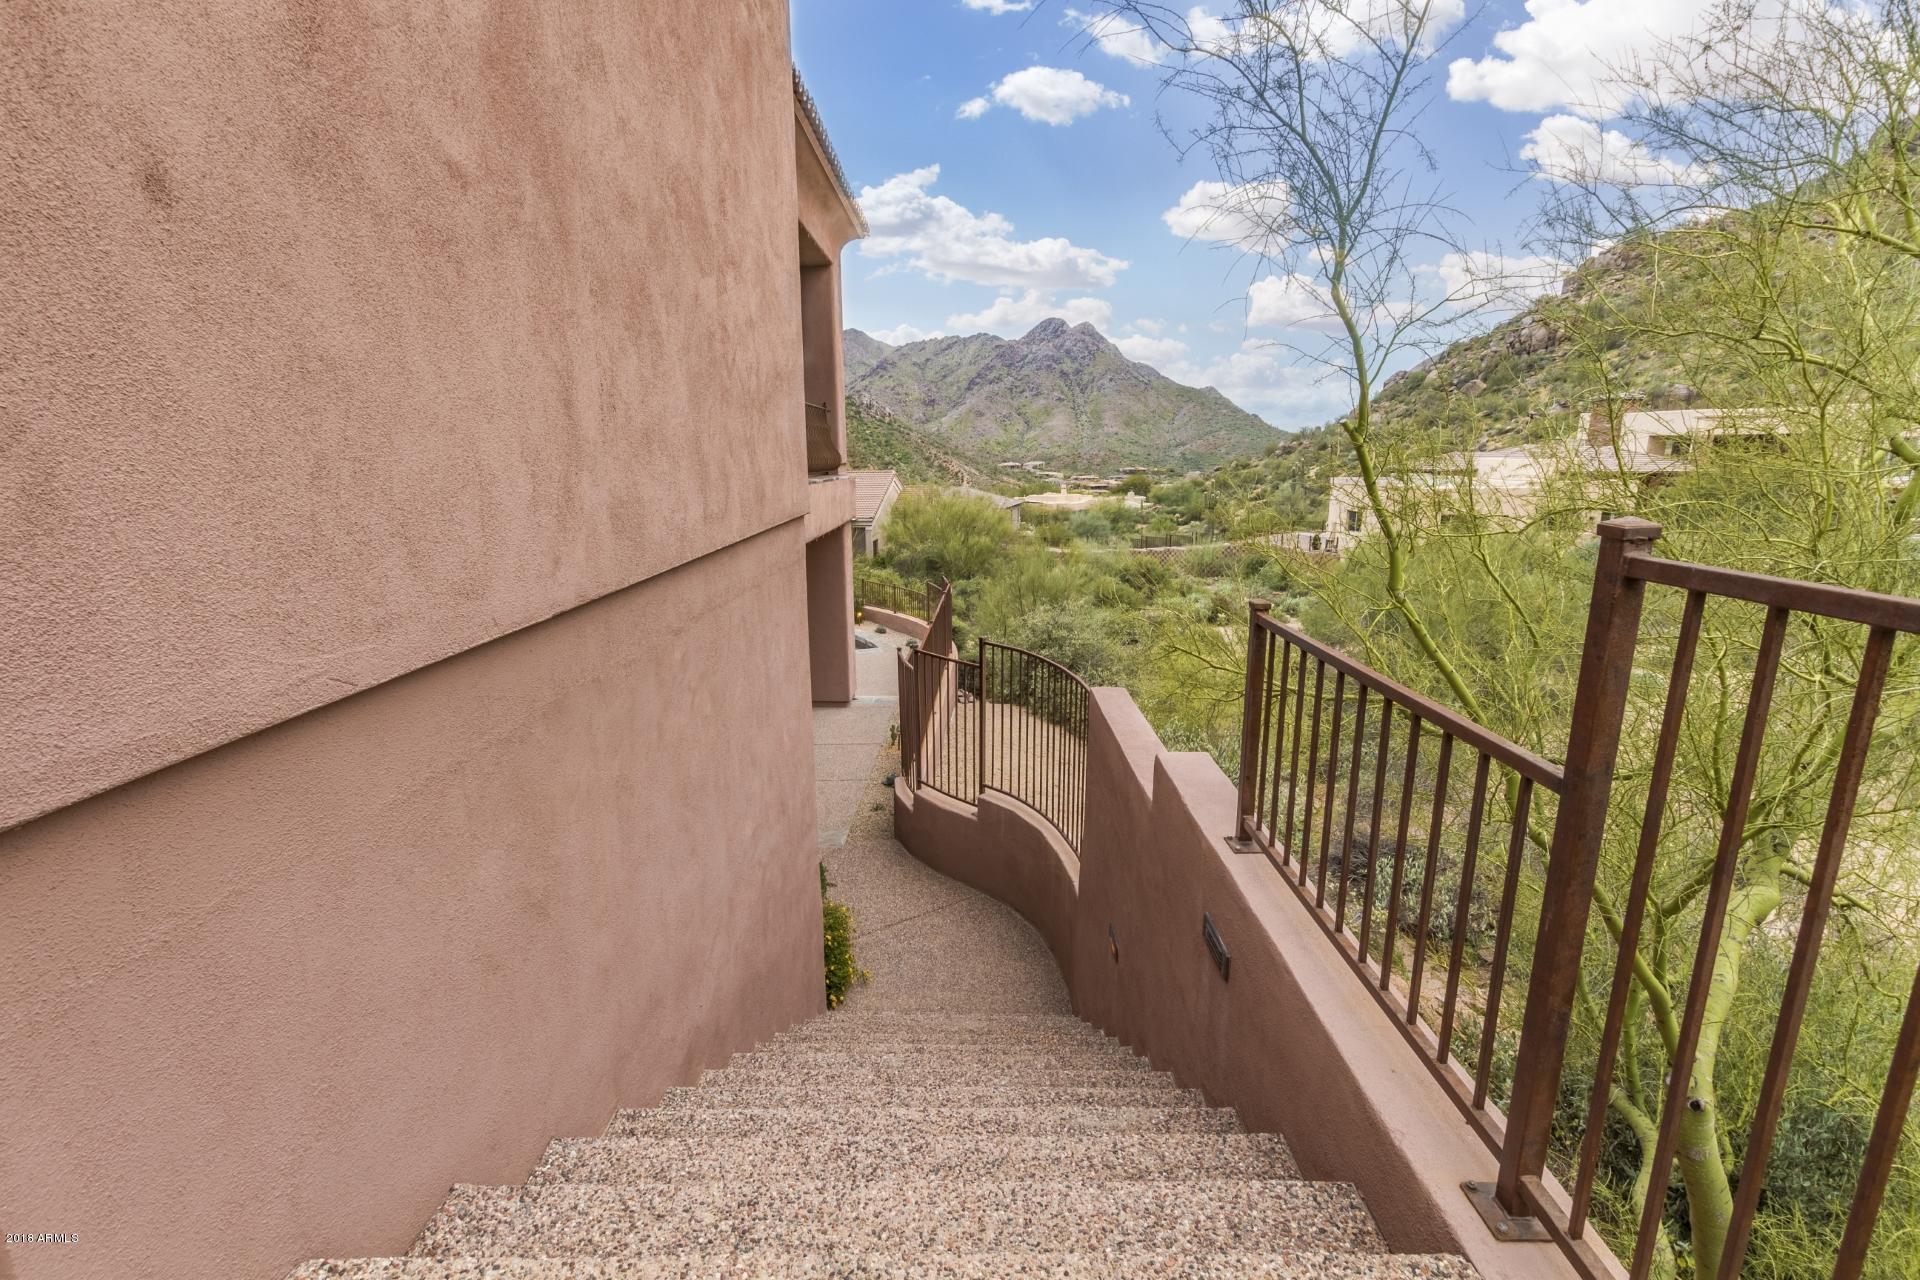 MLS 5859887 11331 E La Junta Road, Scottsdale, AZ 85255 Scottsdale AZ Troon Village